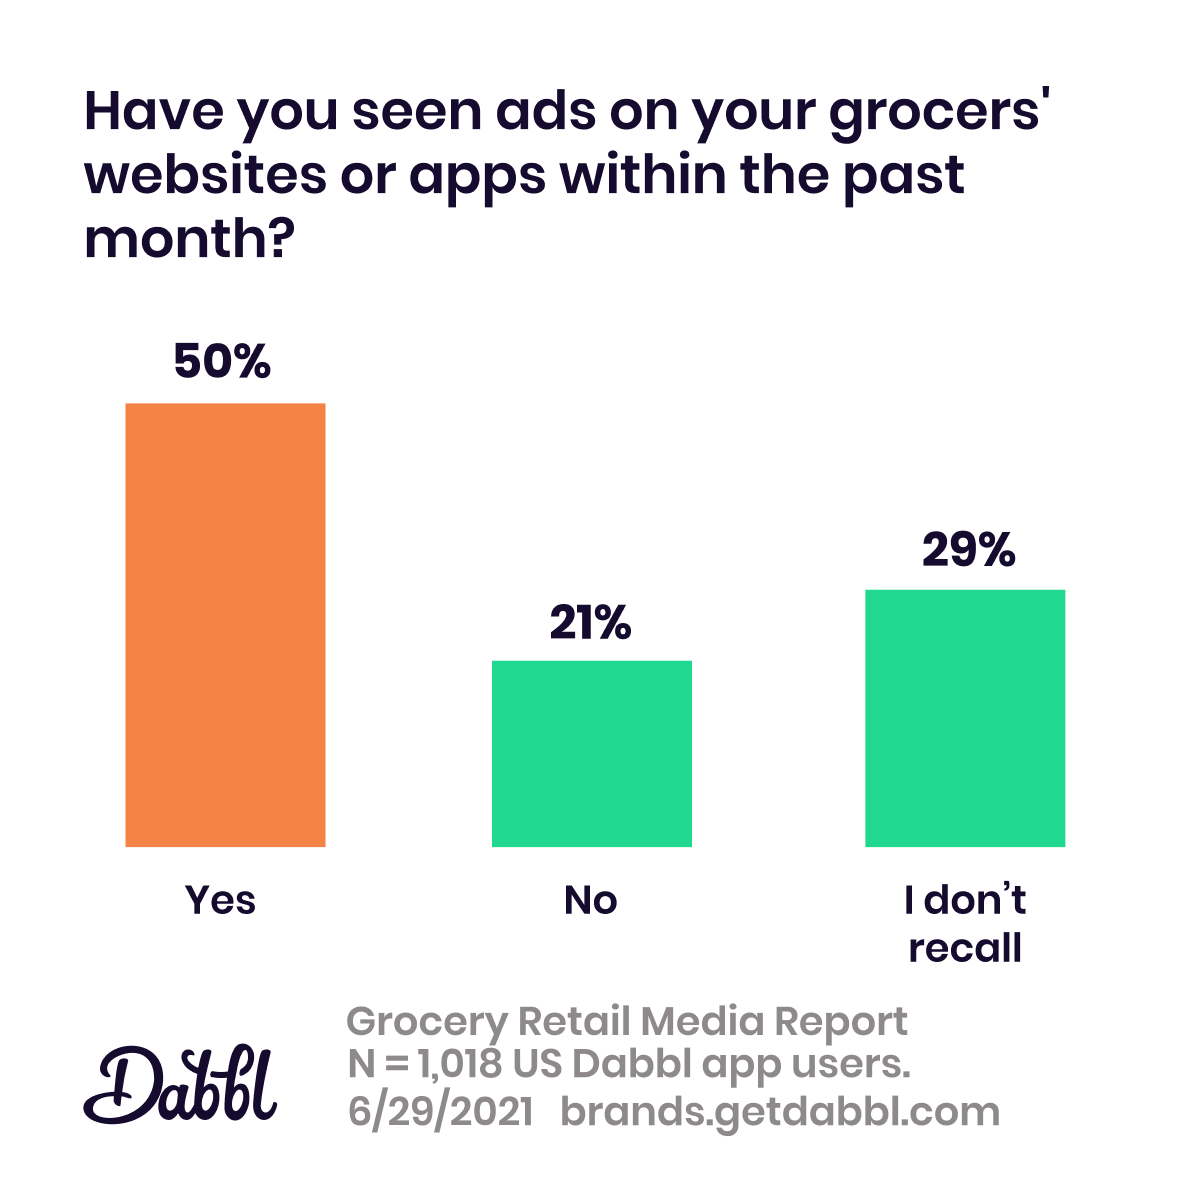 Dabbl Grocery Retail Media Report: retail media ad awareness